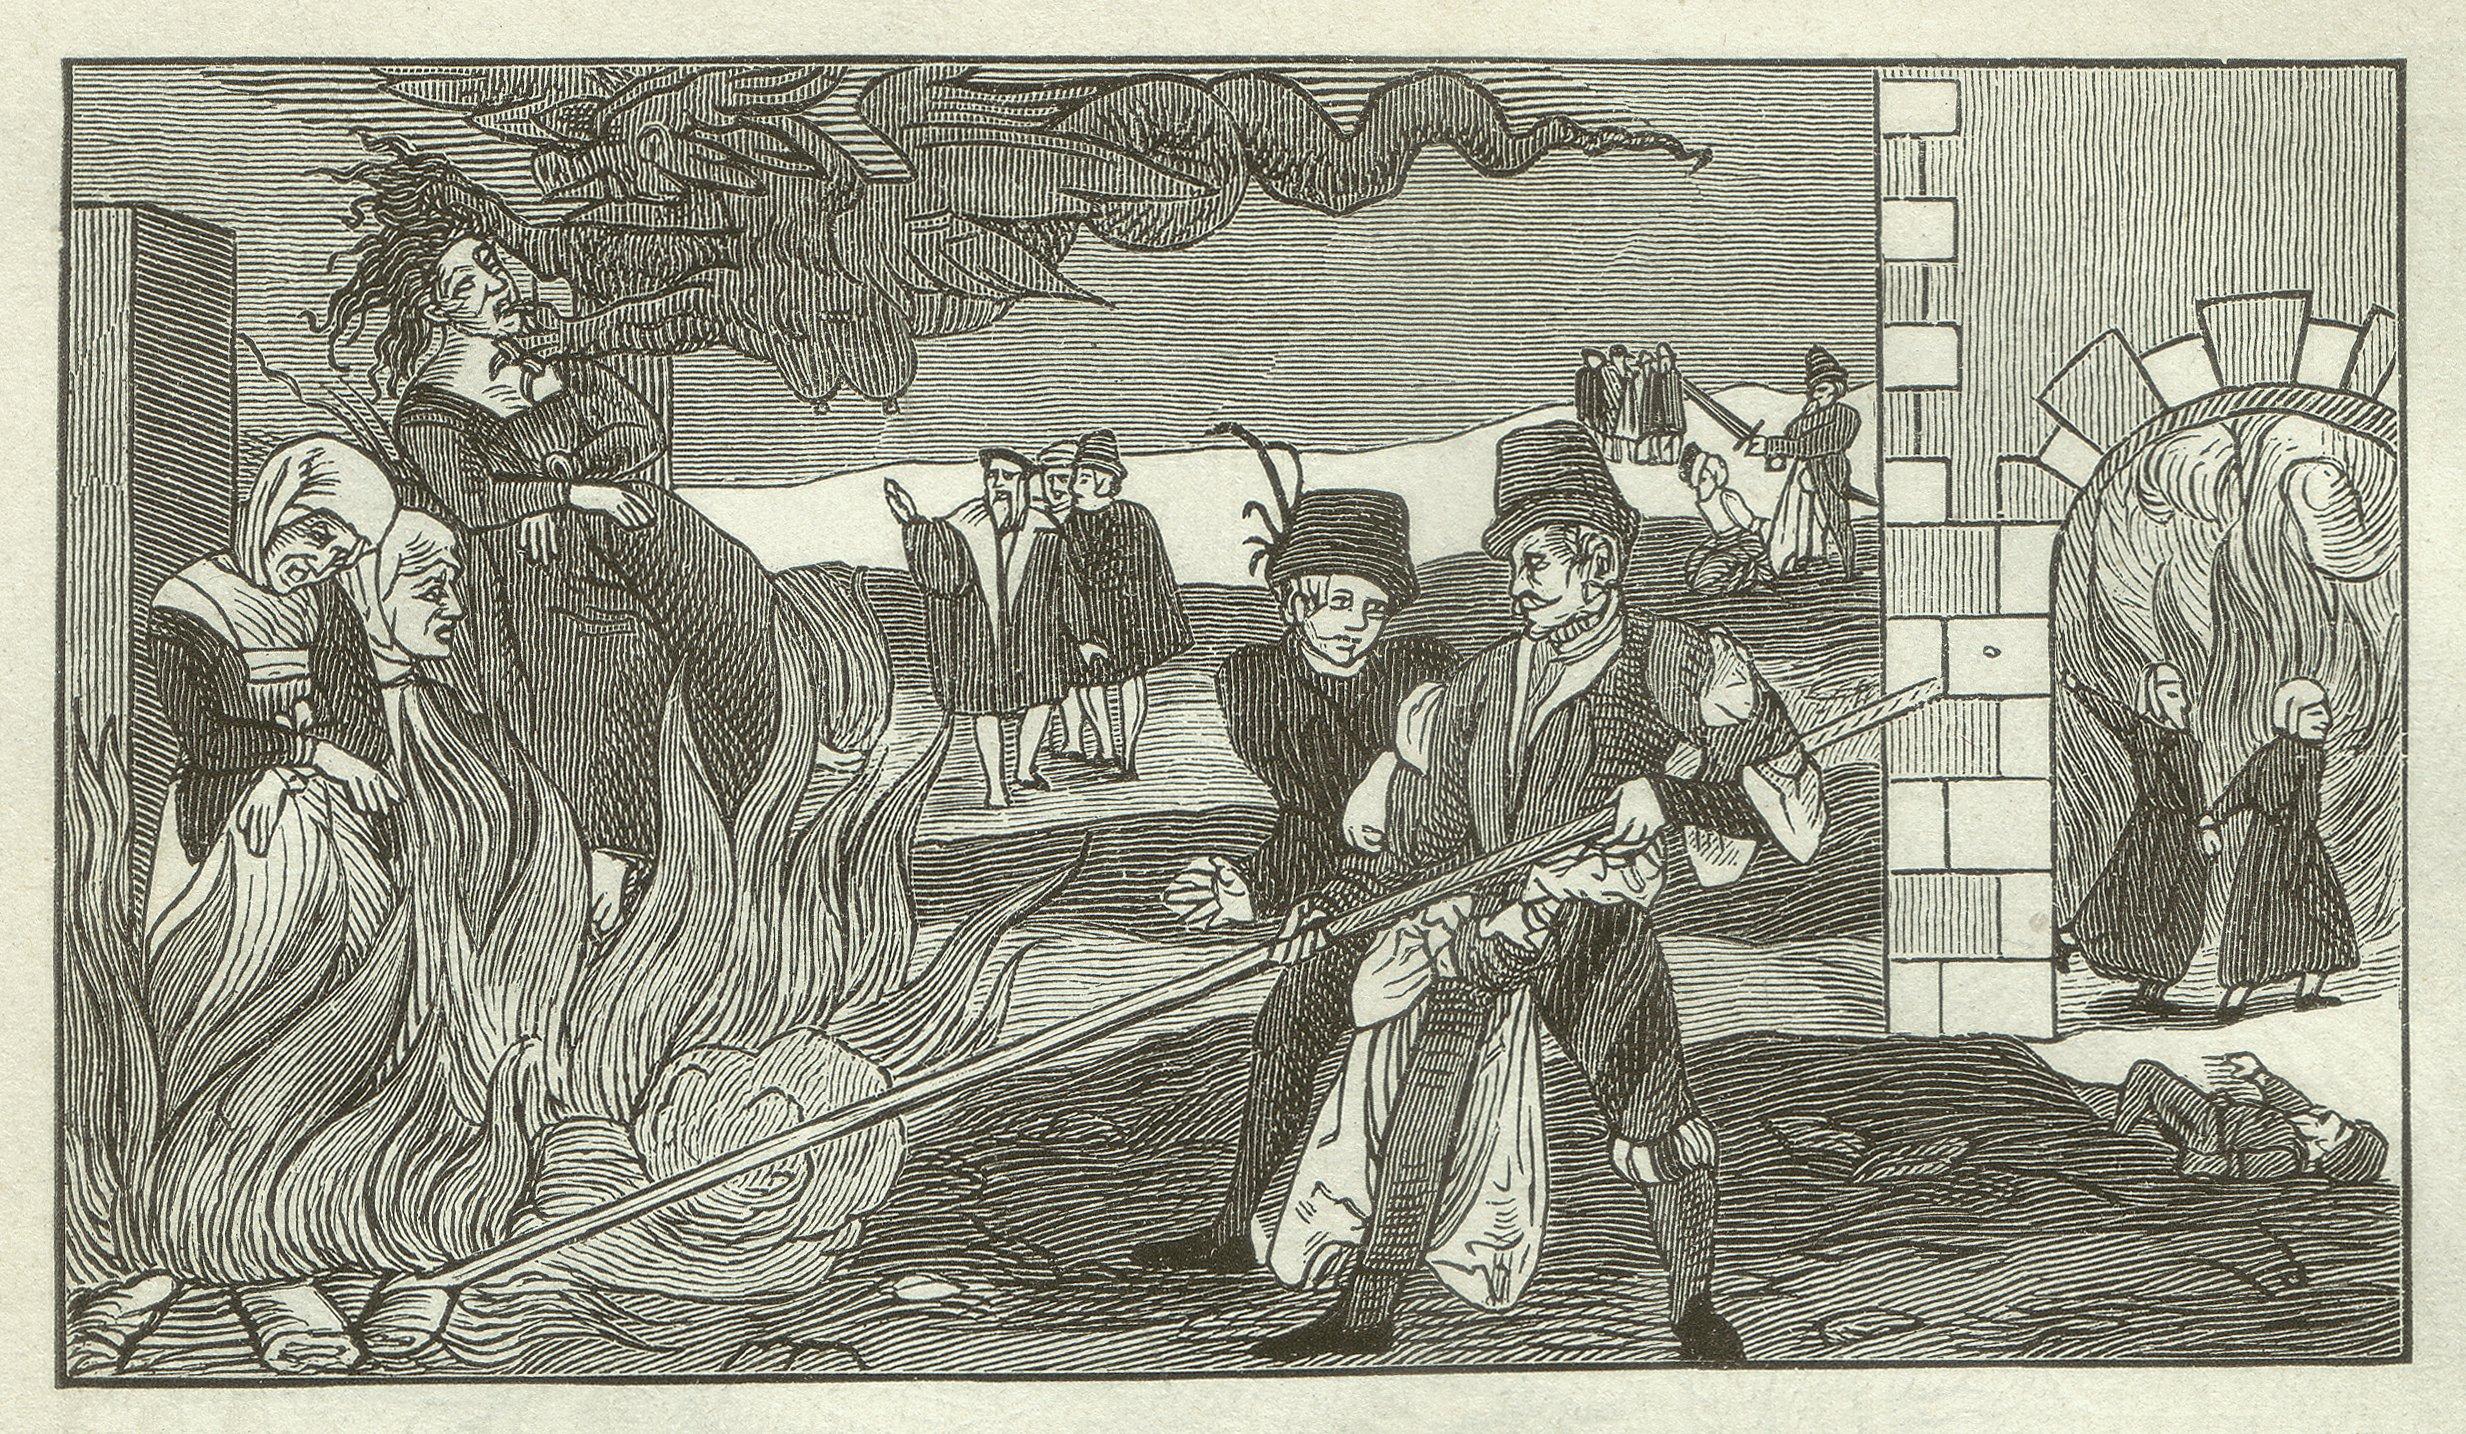 A witch burning in the Reinstein county of Regenstein, Saxony-Anhalt, Germany in 1555. (iStock Photo)